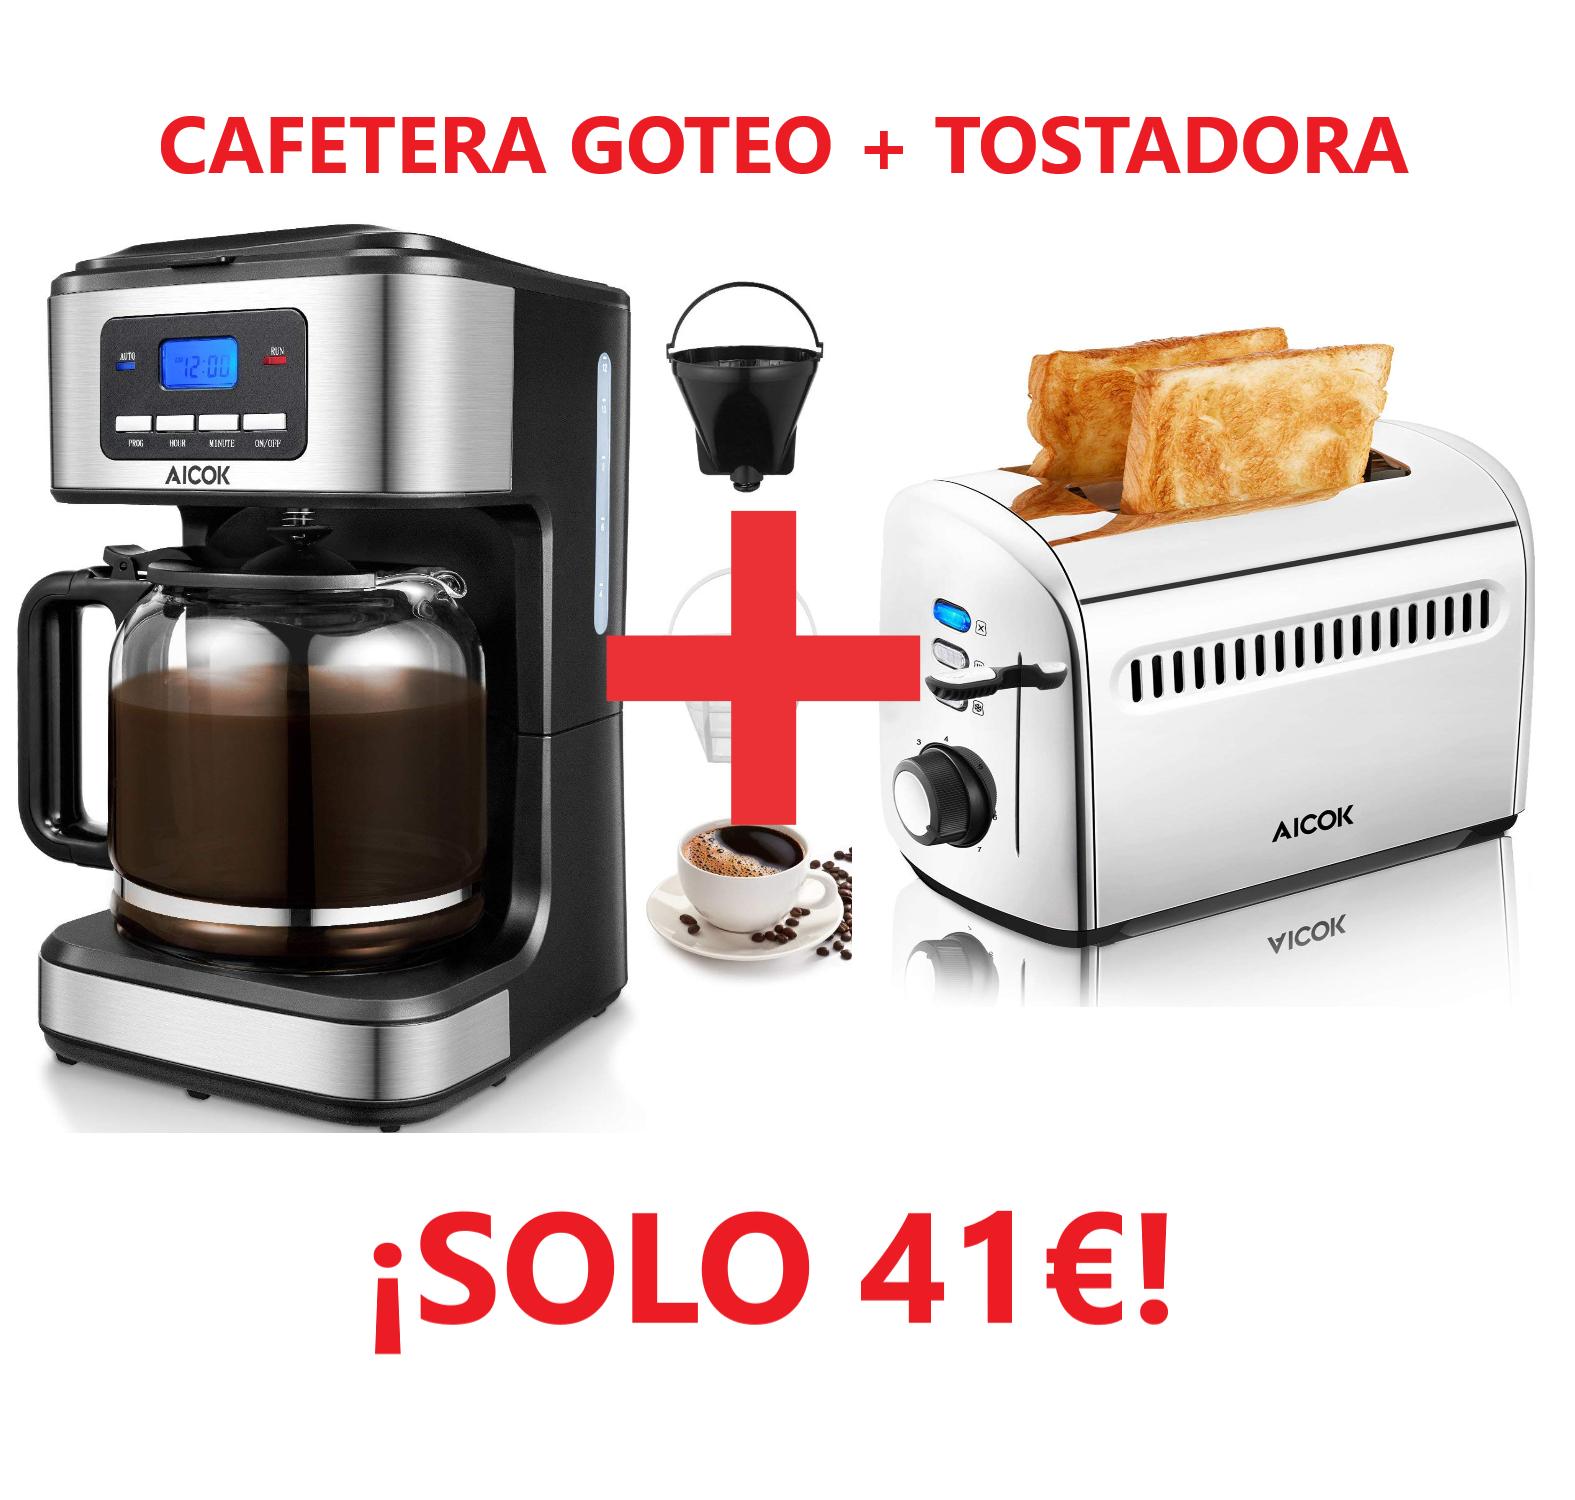 CAFETERA A GOTEO + TOSTADORA AICOK POR SÓLO 41€